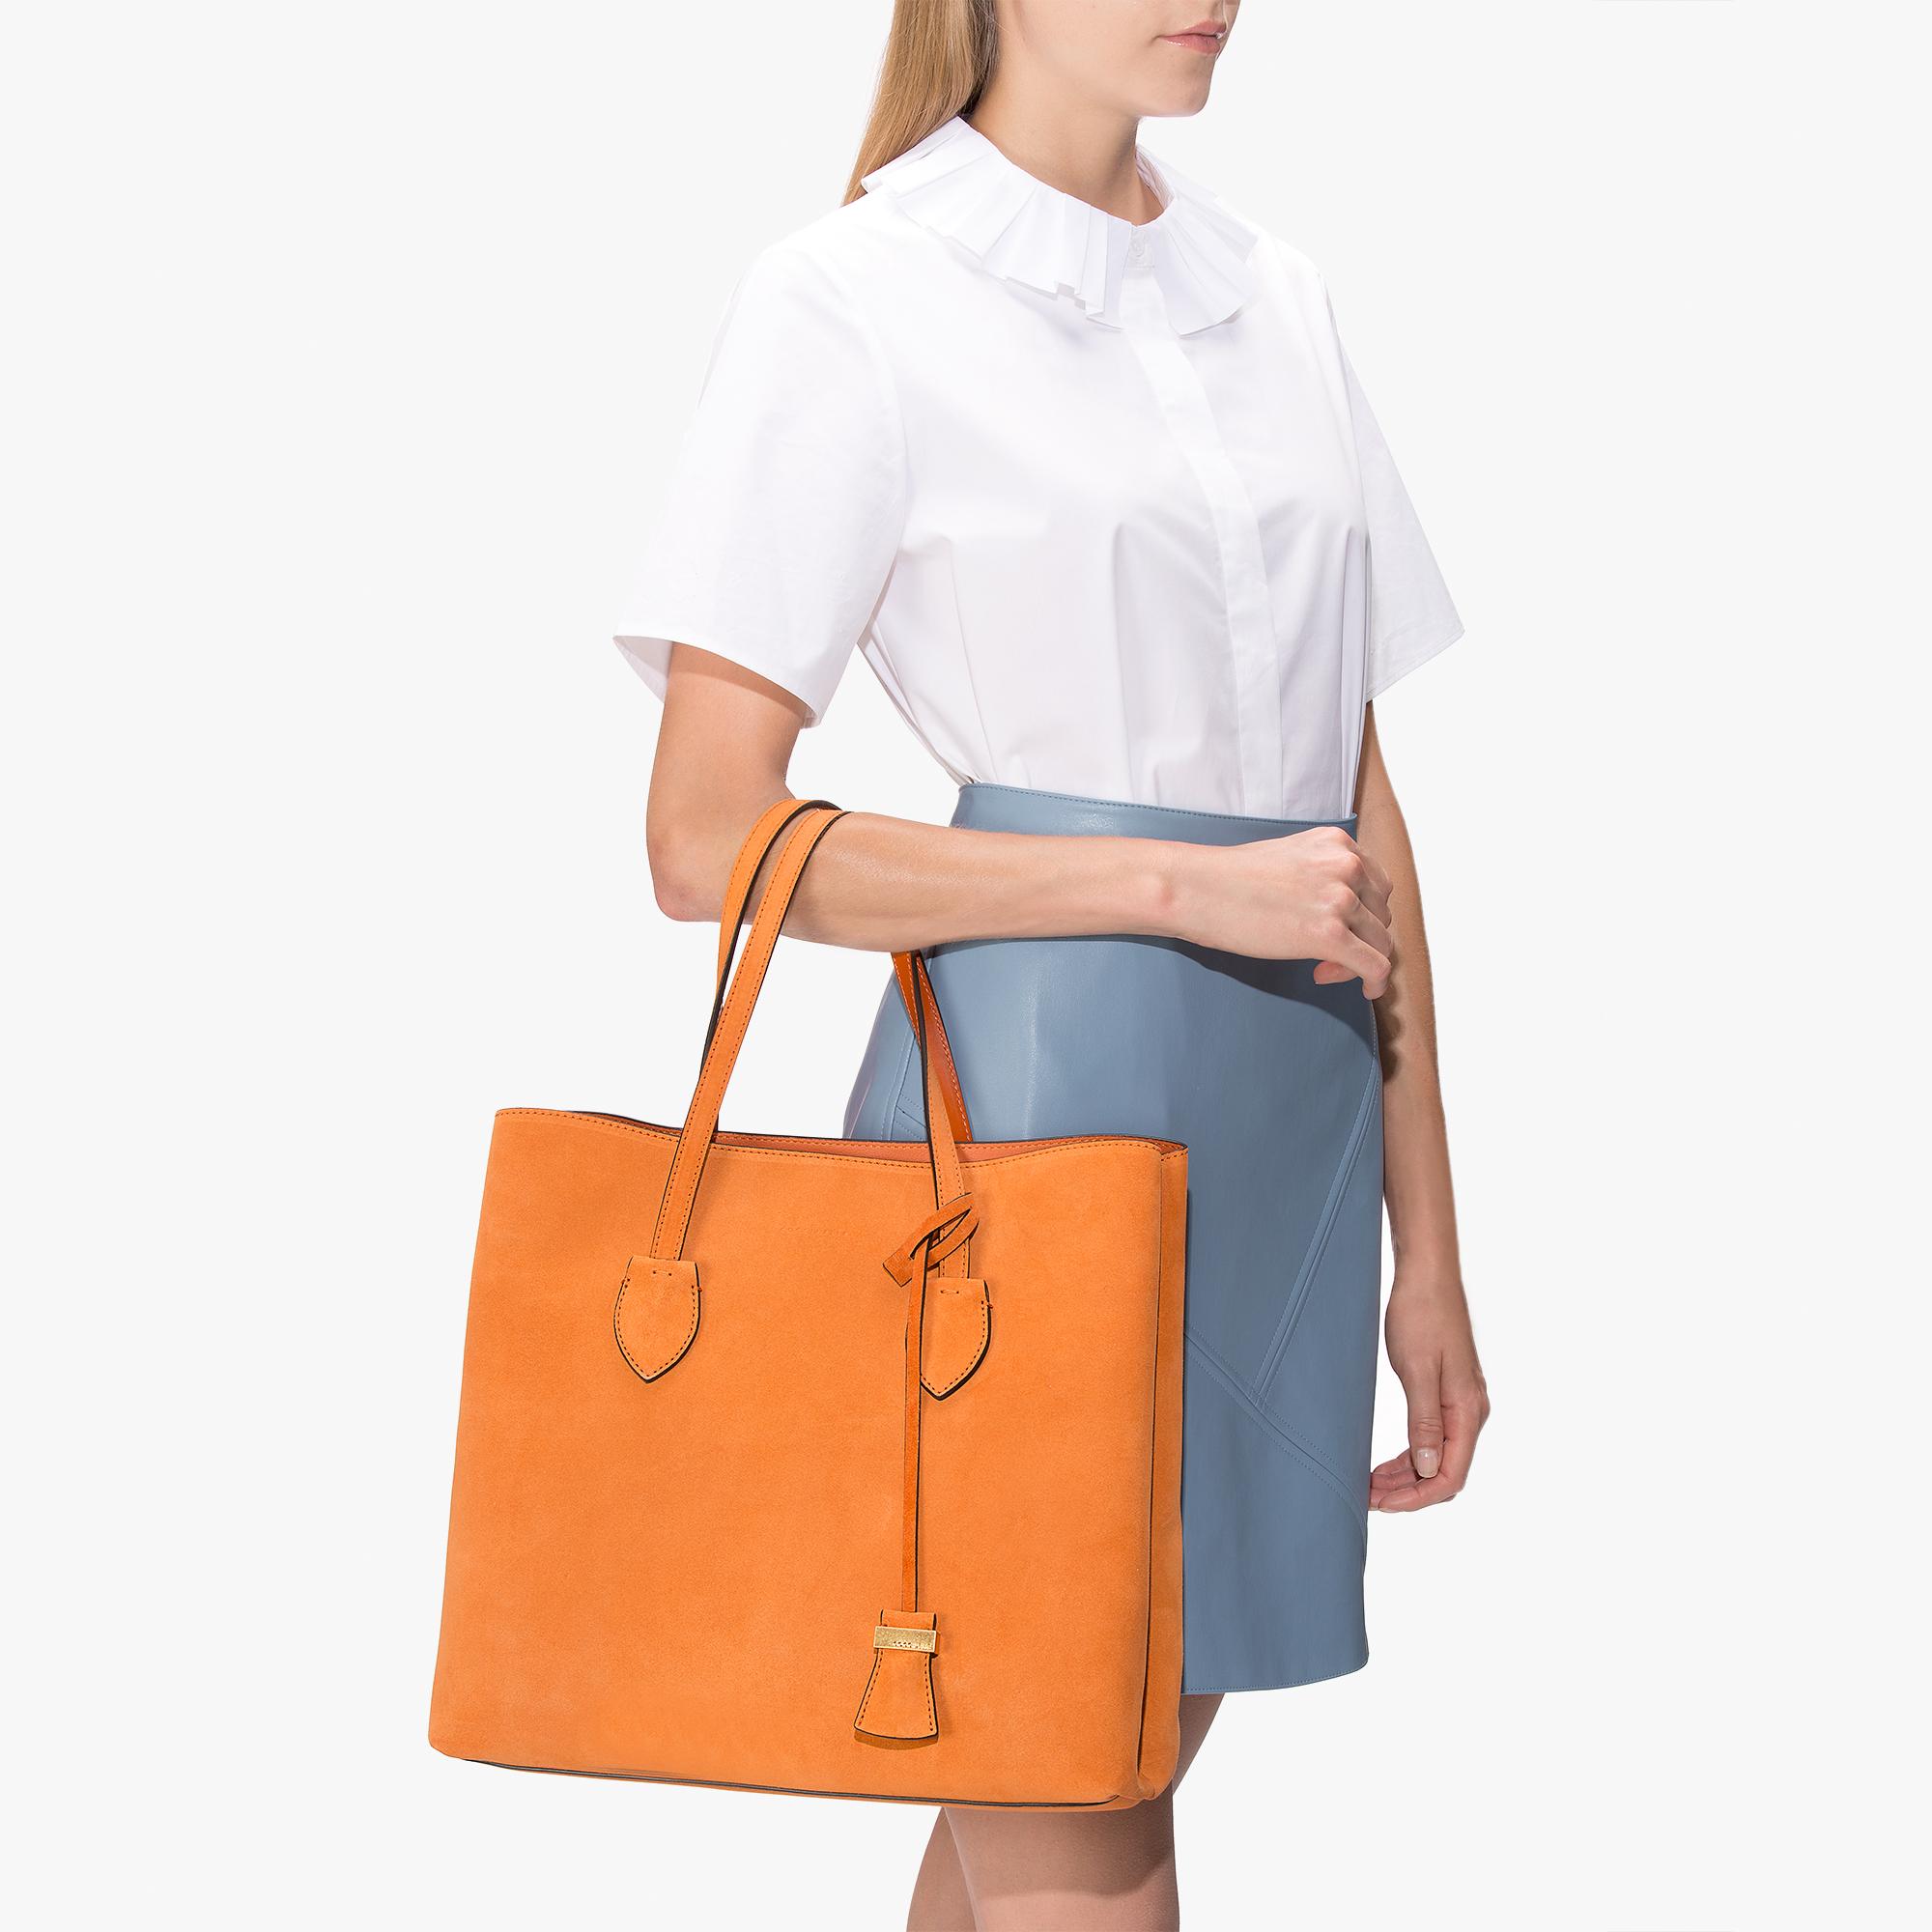 Celene leather shopping tote